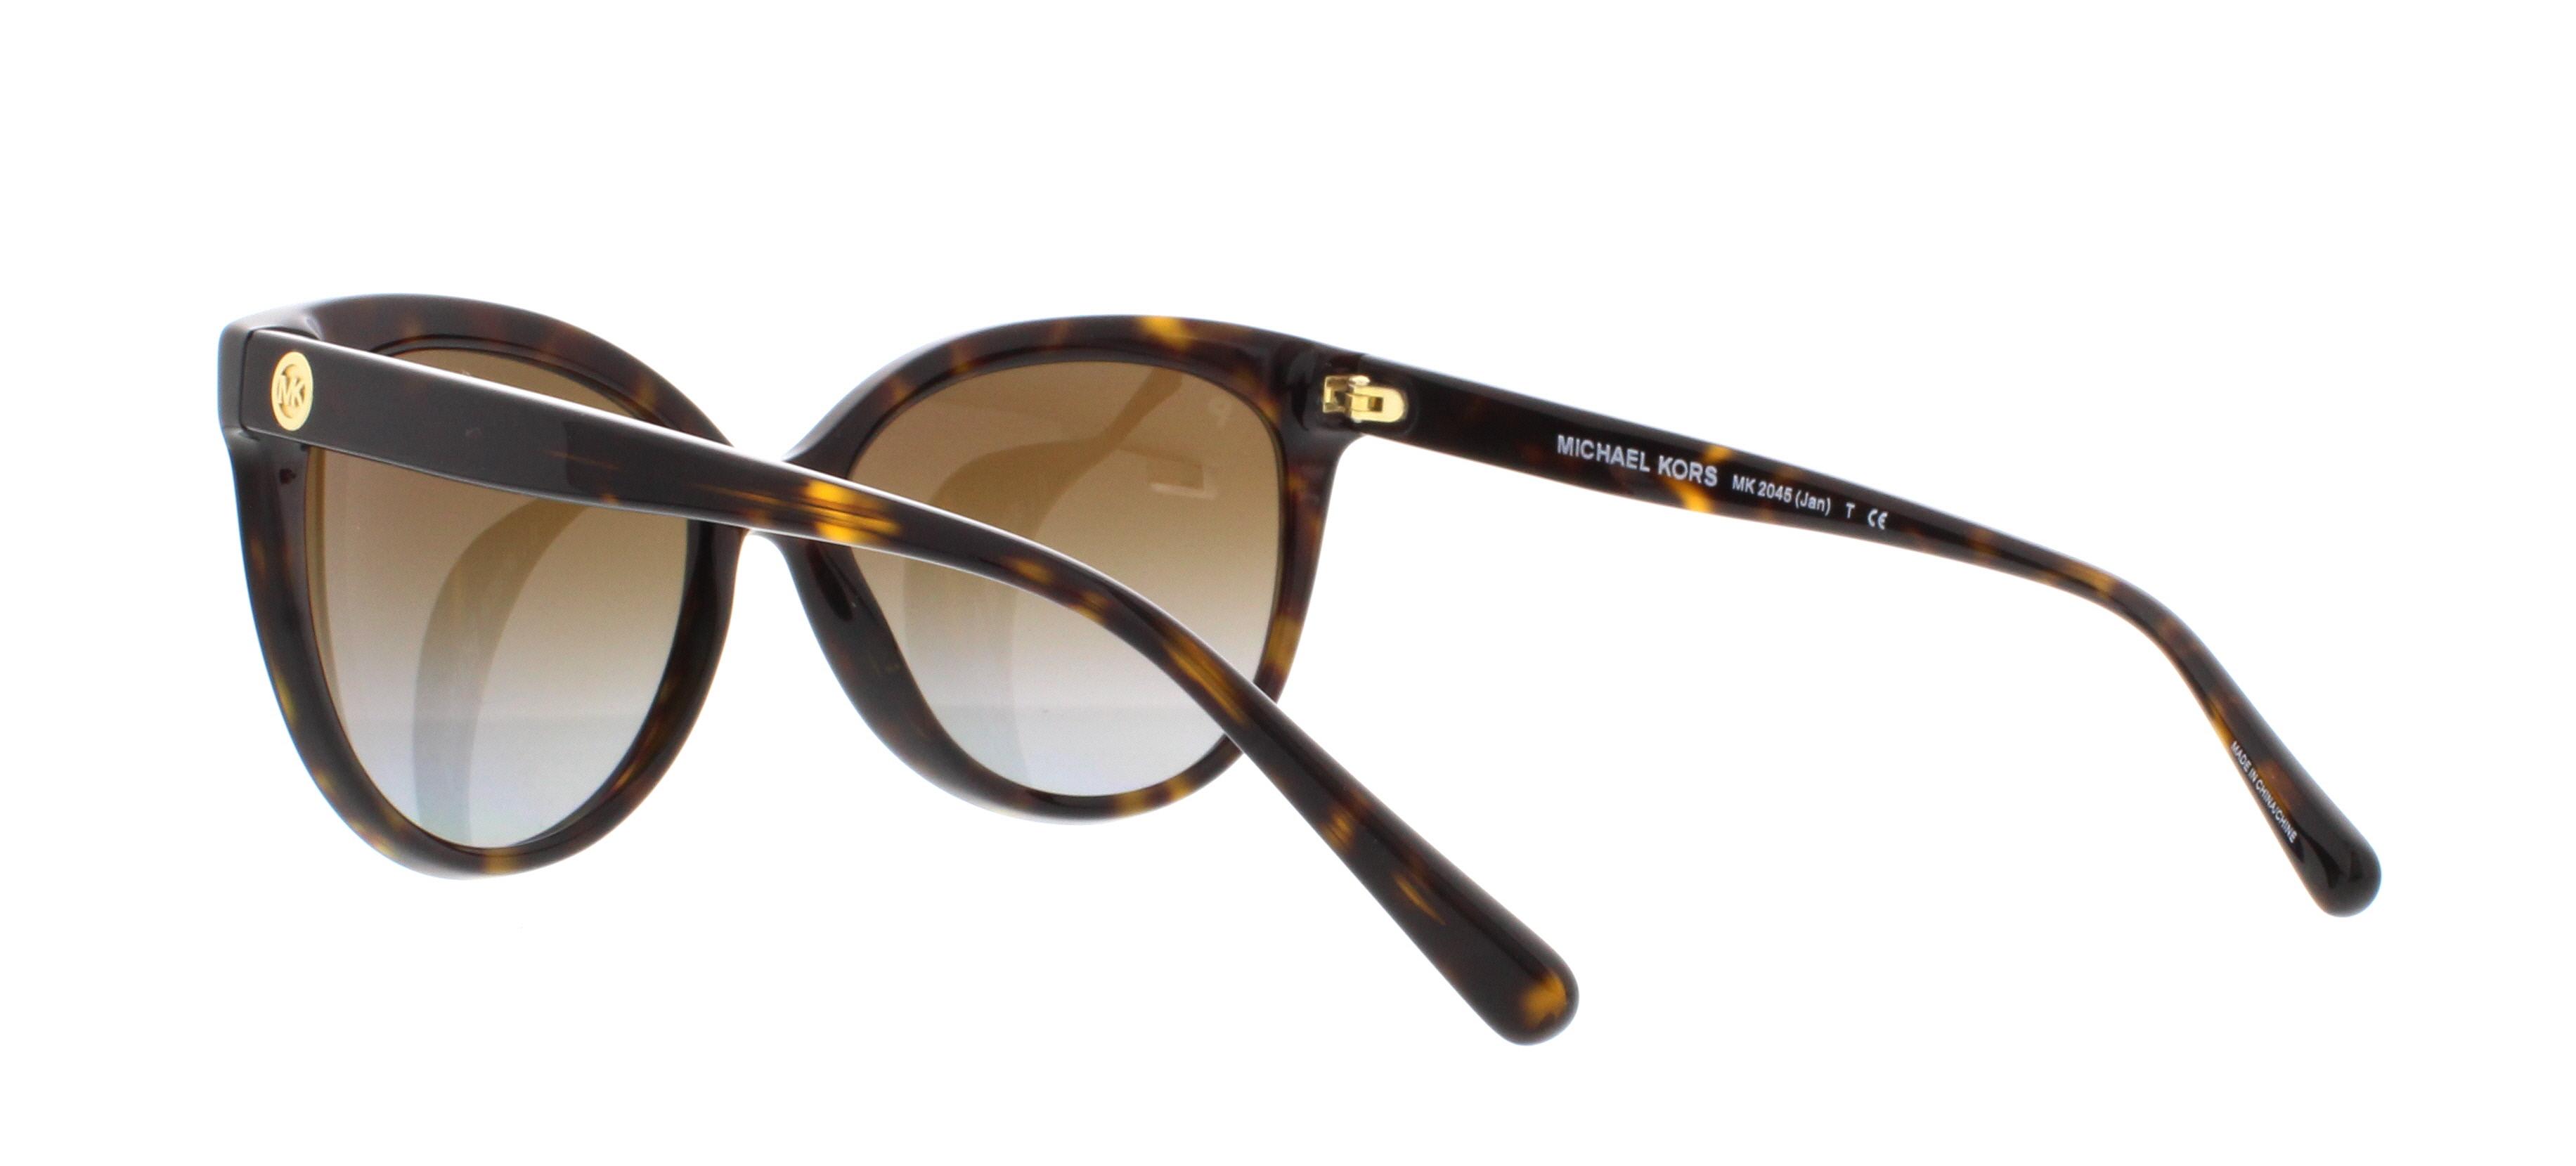 Womens Jan 3006T5 Sunglasses, Dark Tortoise Acetate/Browngradientpolarized, 55 Michael Kors